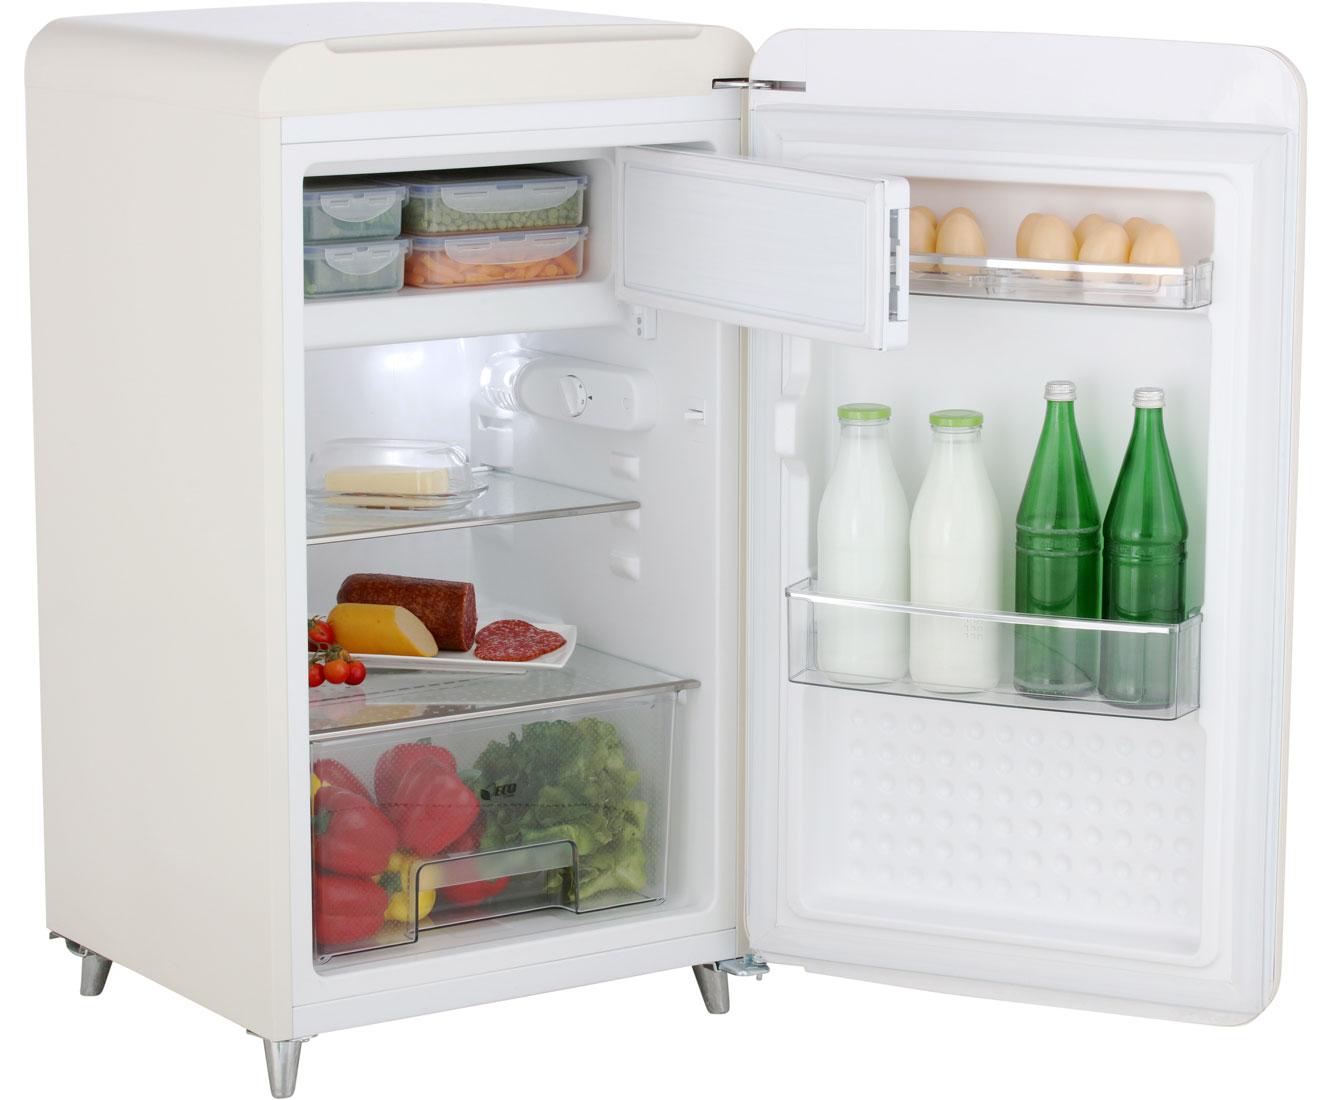 Bomann Kühlschrank Garantie : Bomann ksr kühlschrank freistehend cm beige neu ebay